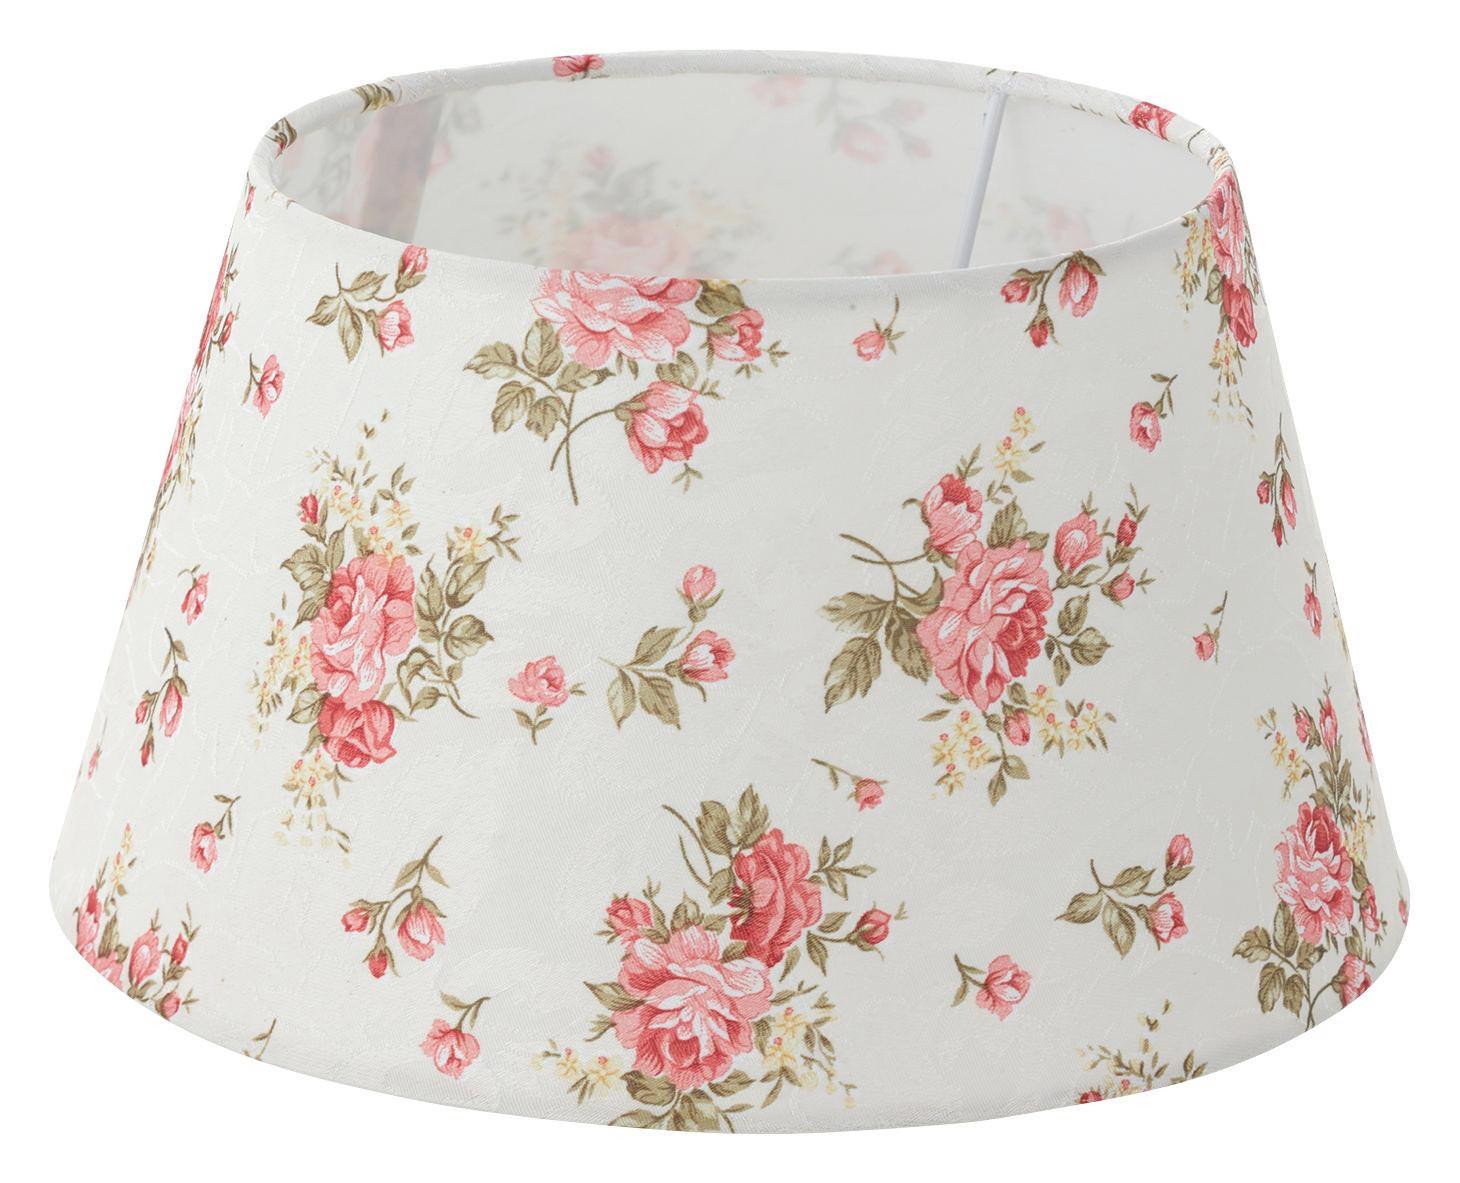 LEUCHTENSCHIRM  Rosa, Weiß  Textil  E27 - Rosa/Weiß, LIFESTYLE, Textil (25/14cm) - LANDSCAPE